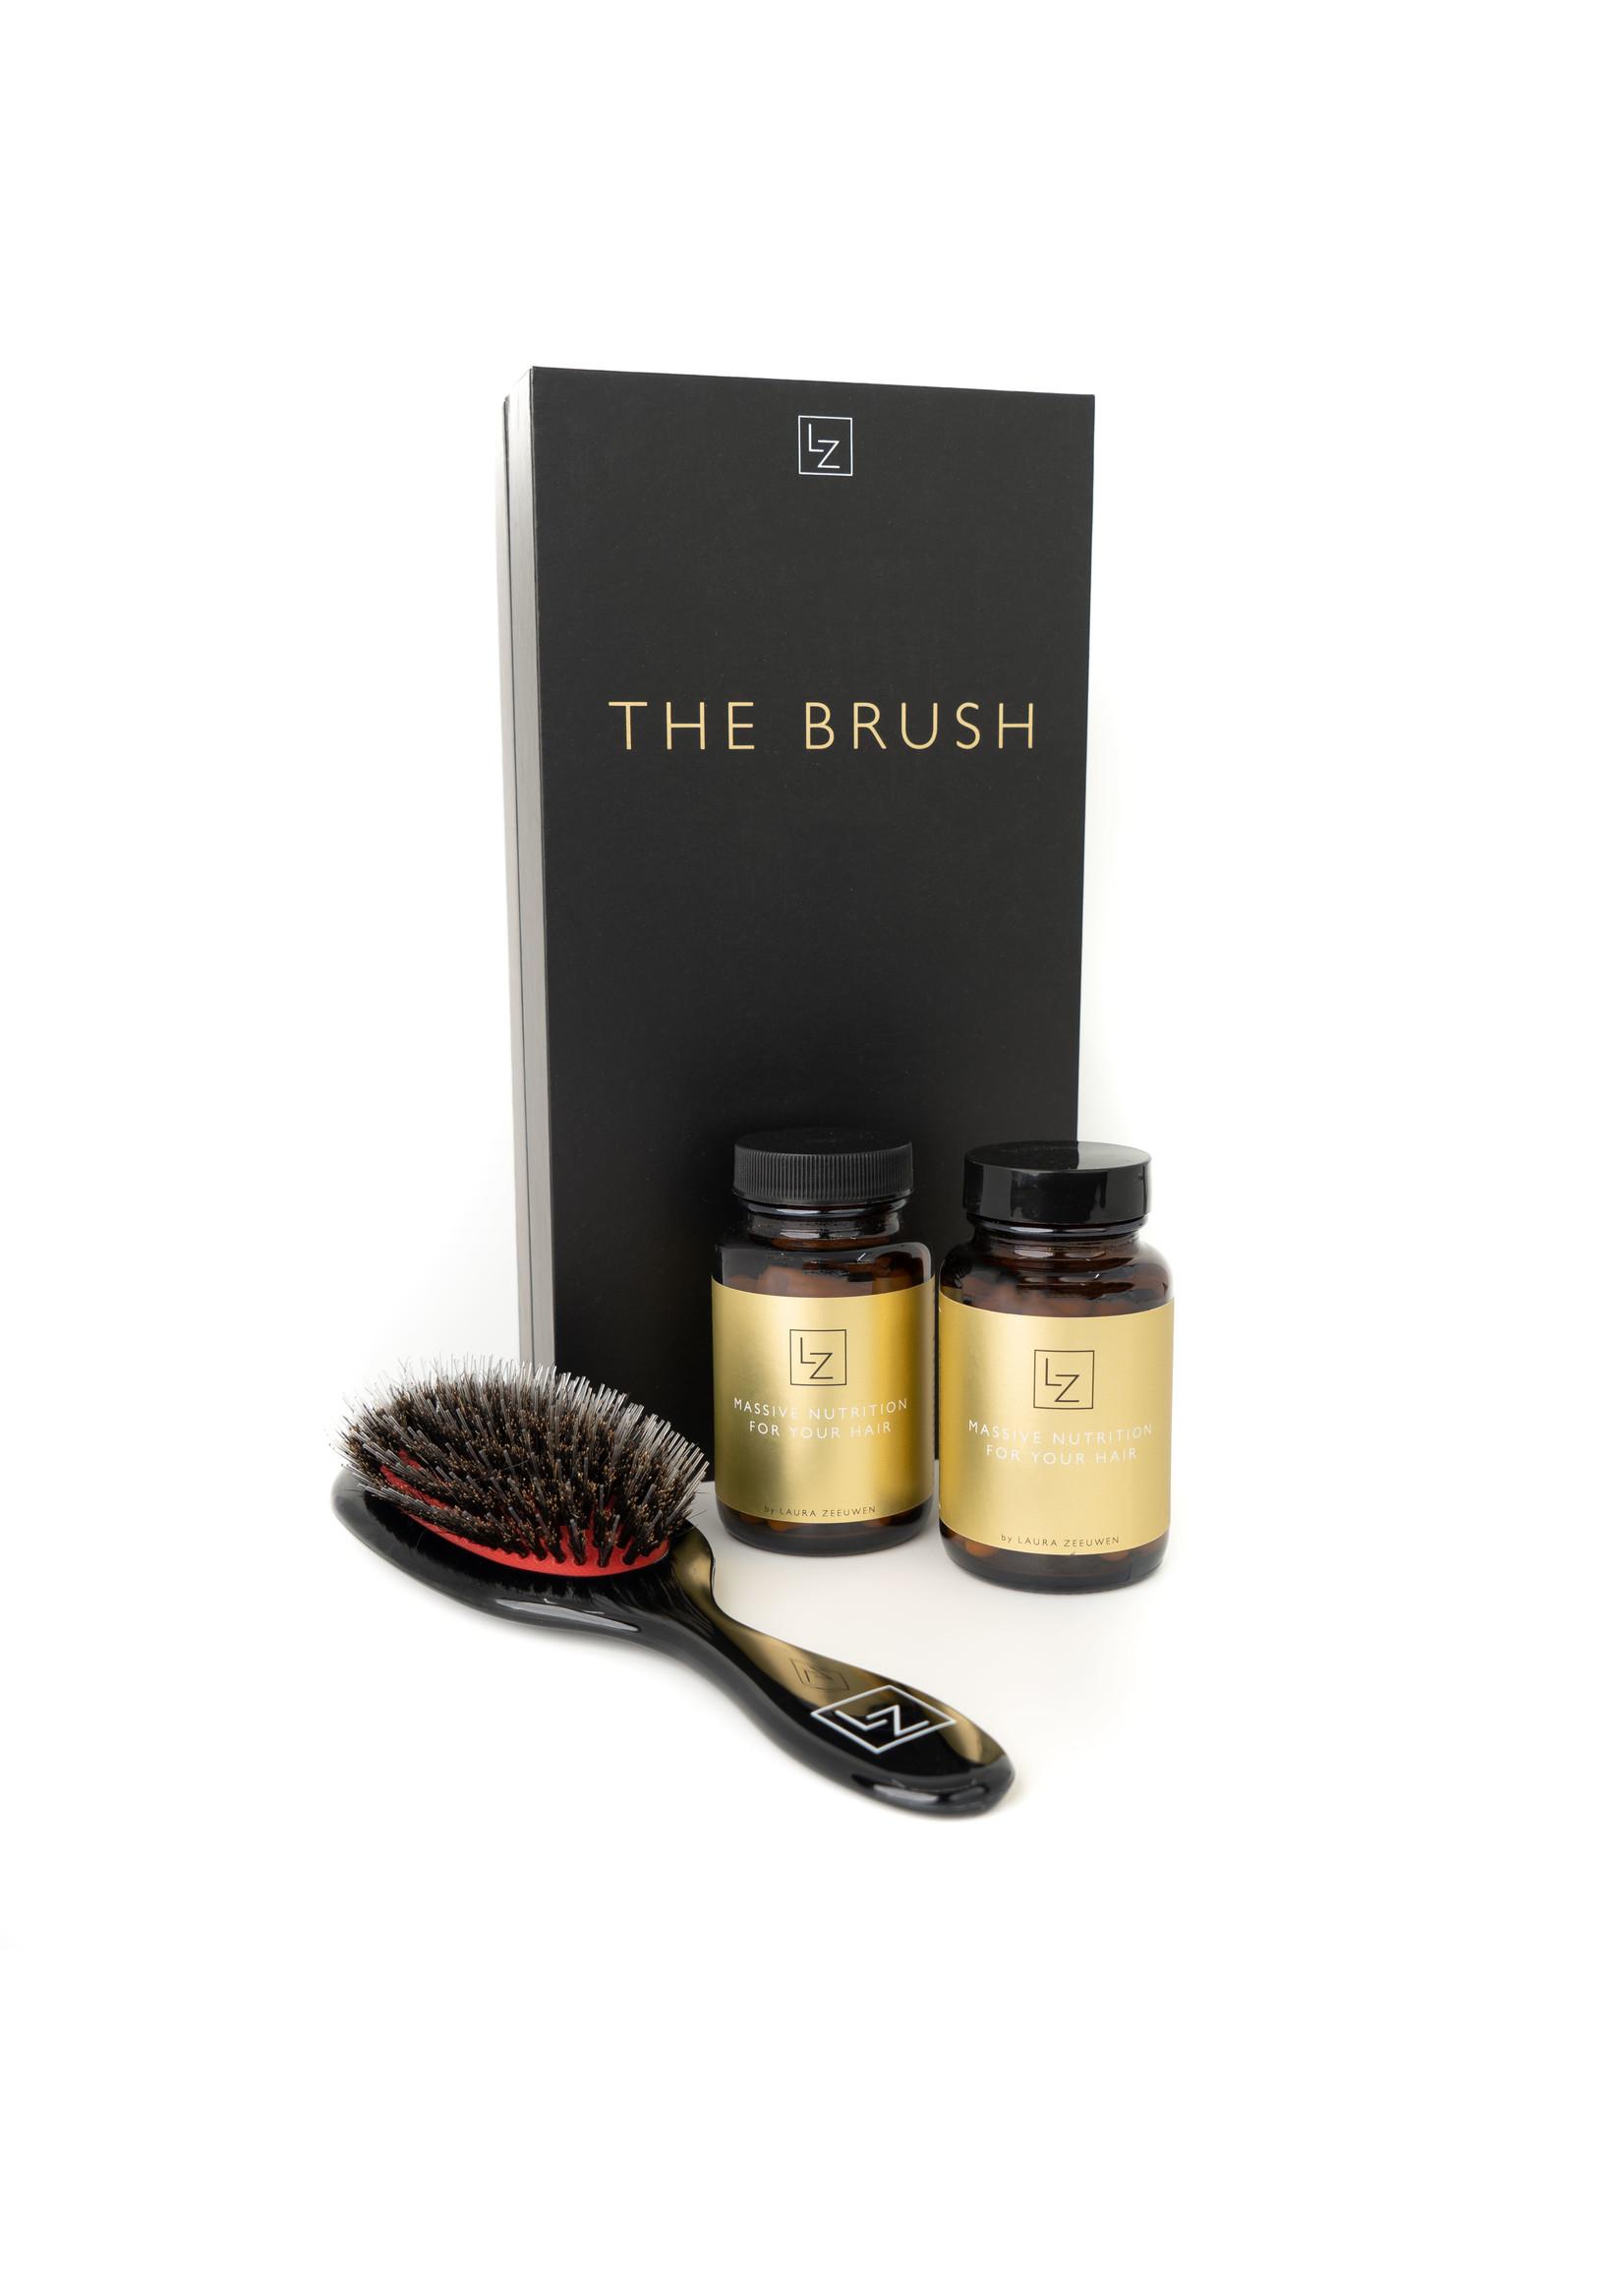 The Brush + 2 Massive Nutrition